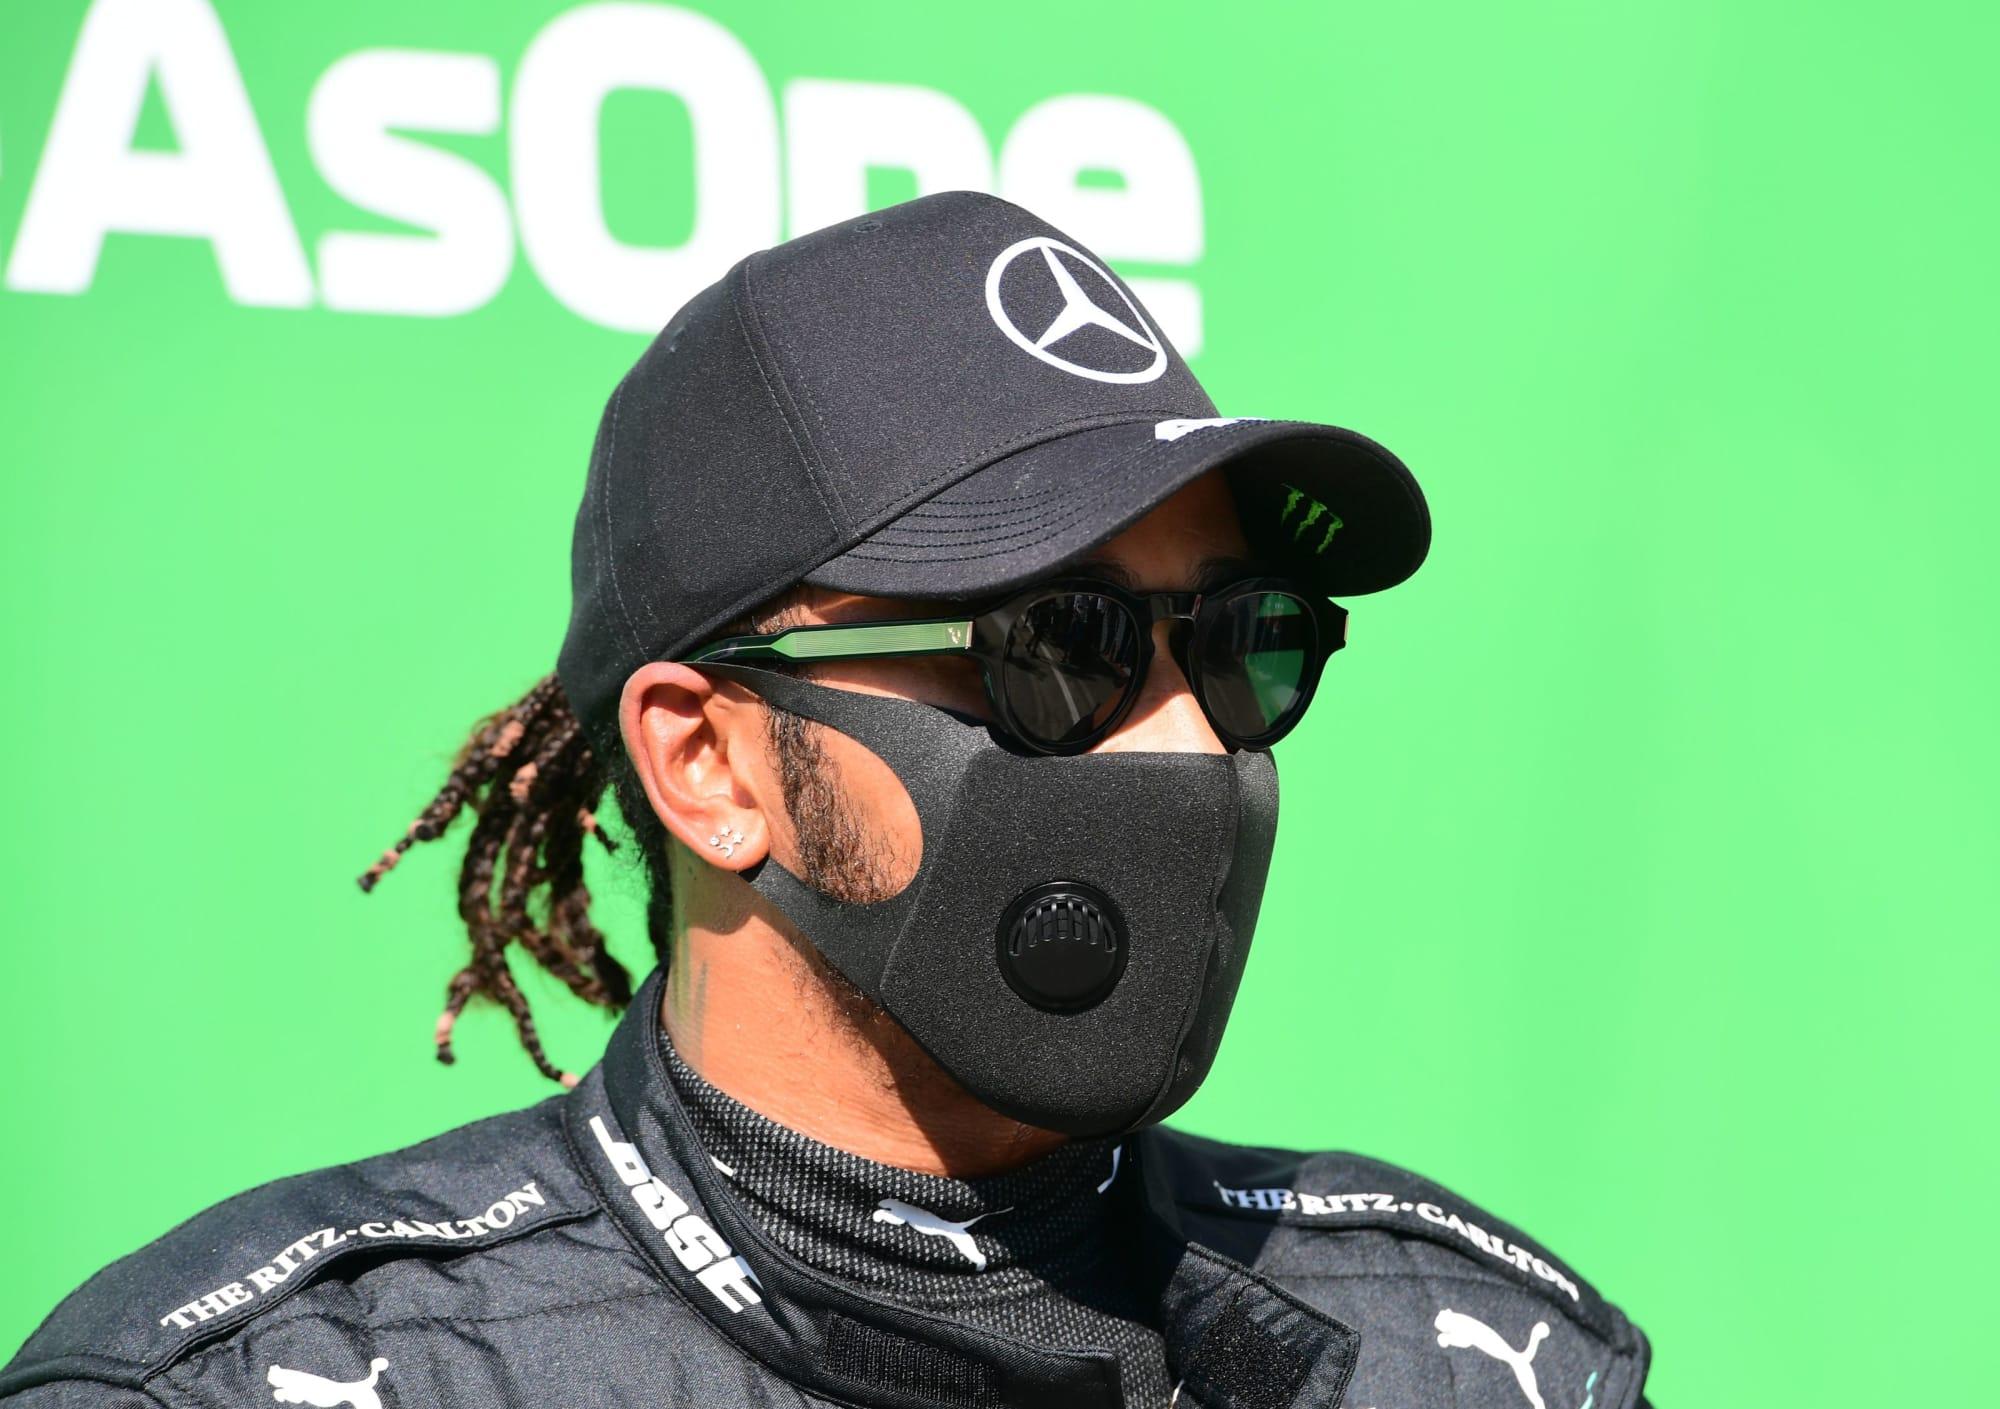 Formula 1: 'Lewis to Renault confirmed', say Mercedes